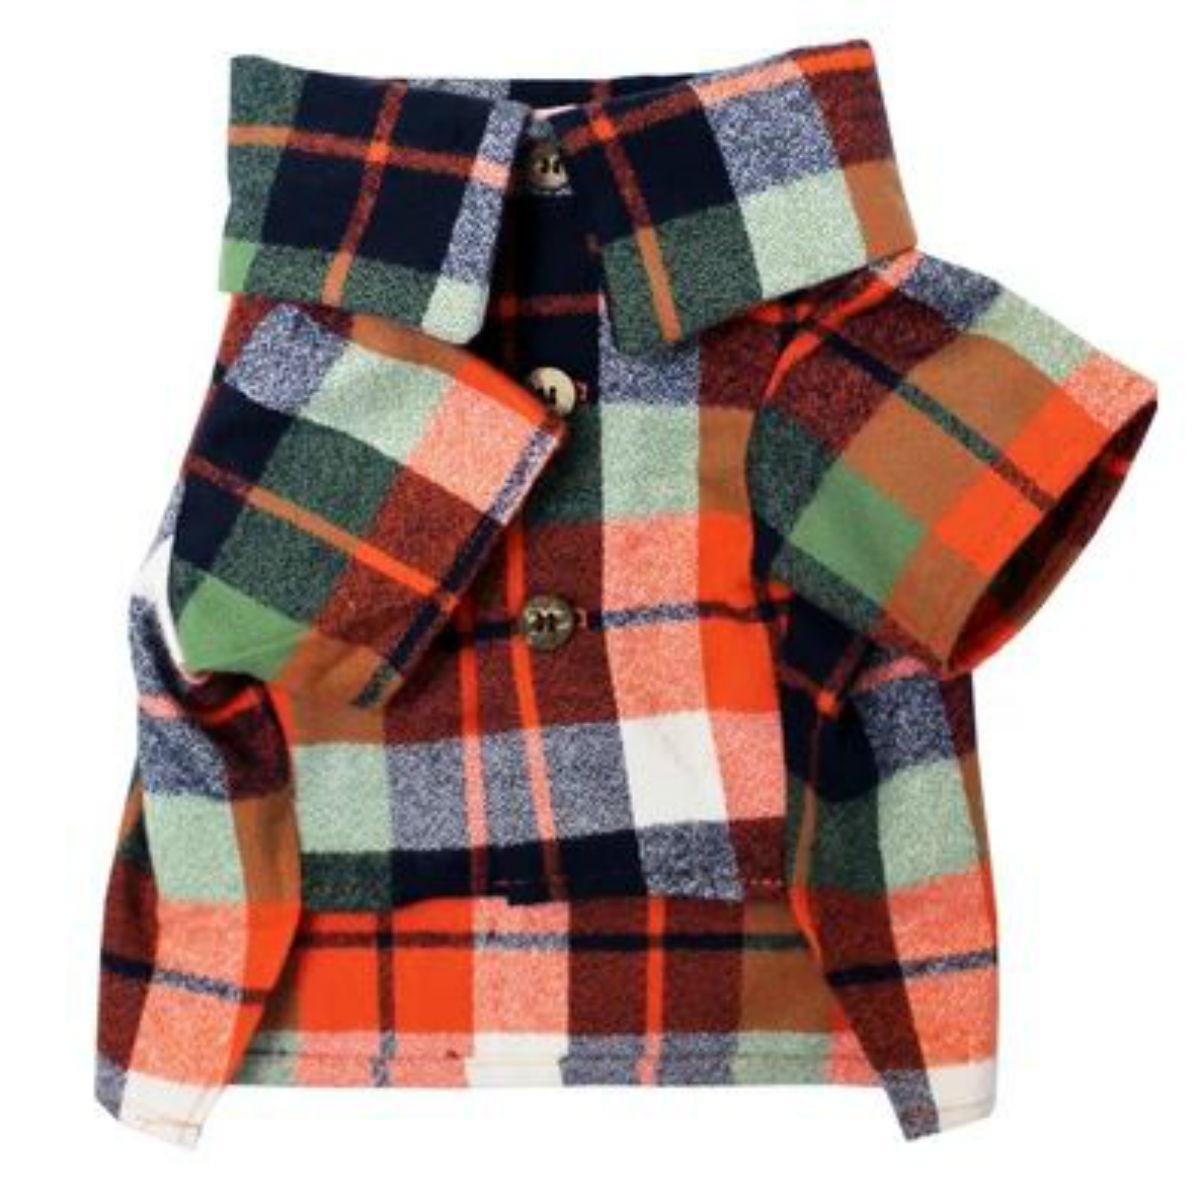 Harvest Flannel Dog Shirt by Dog Threads - Orange Plaid